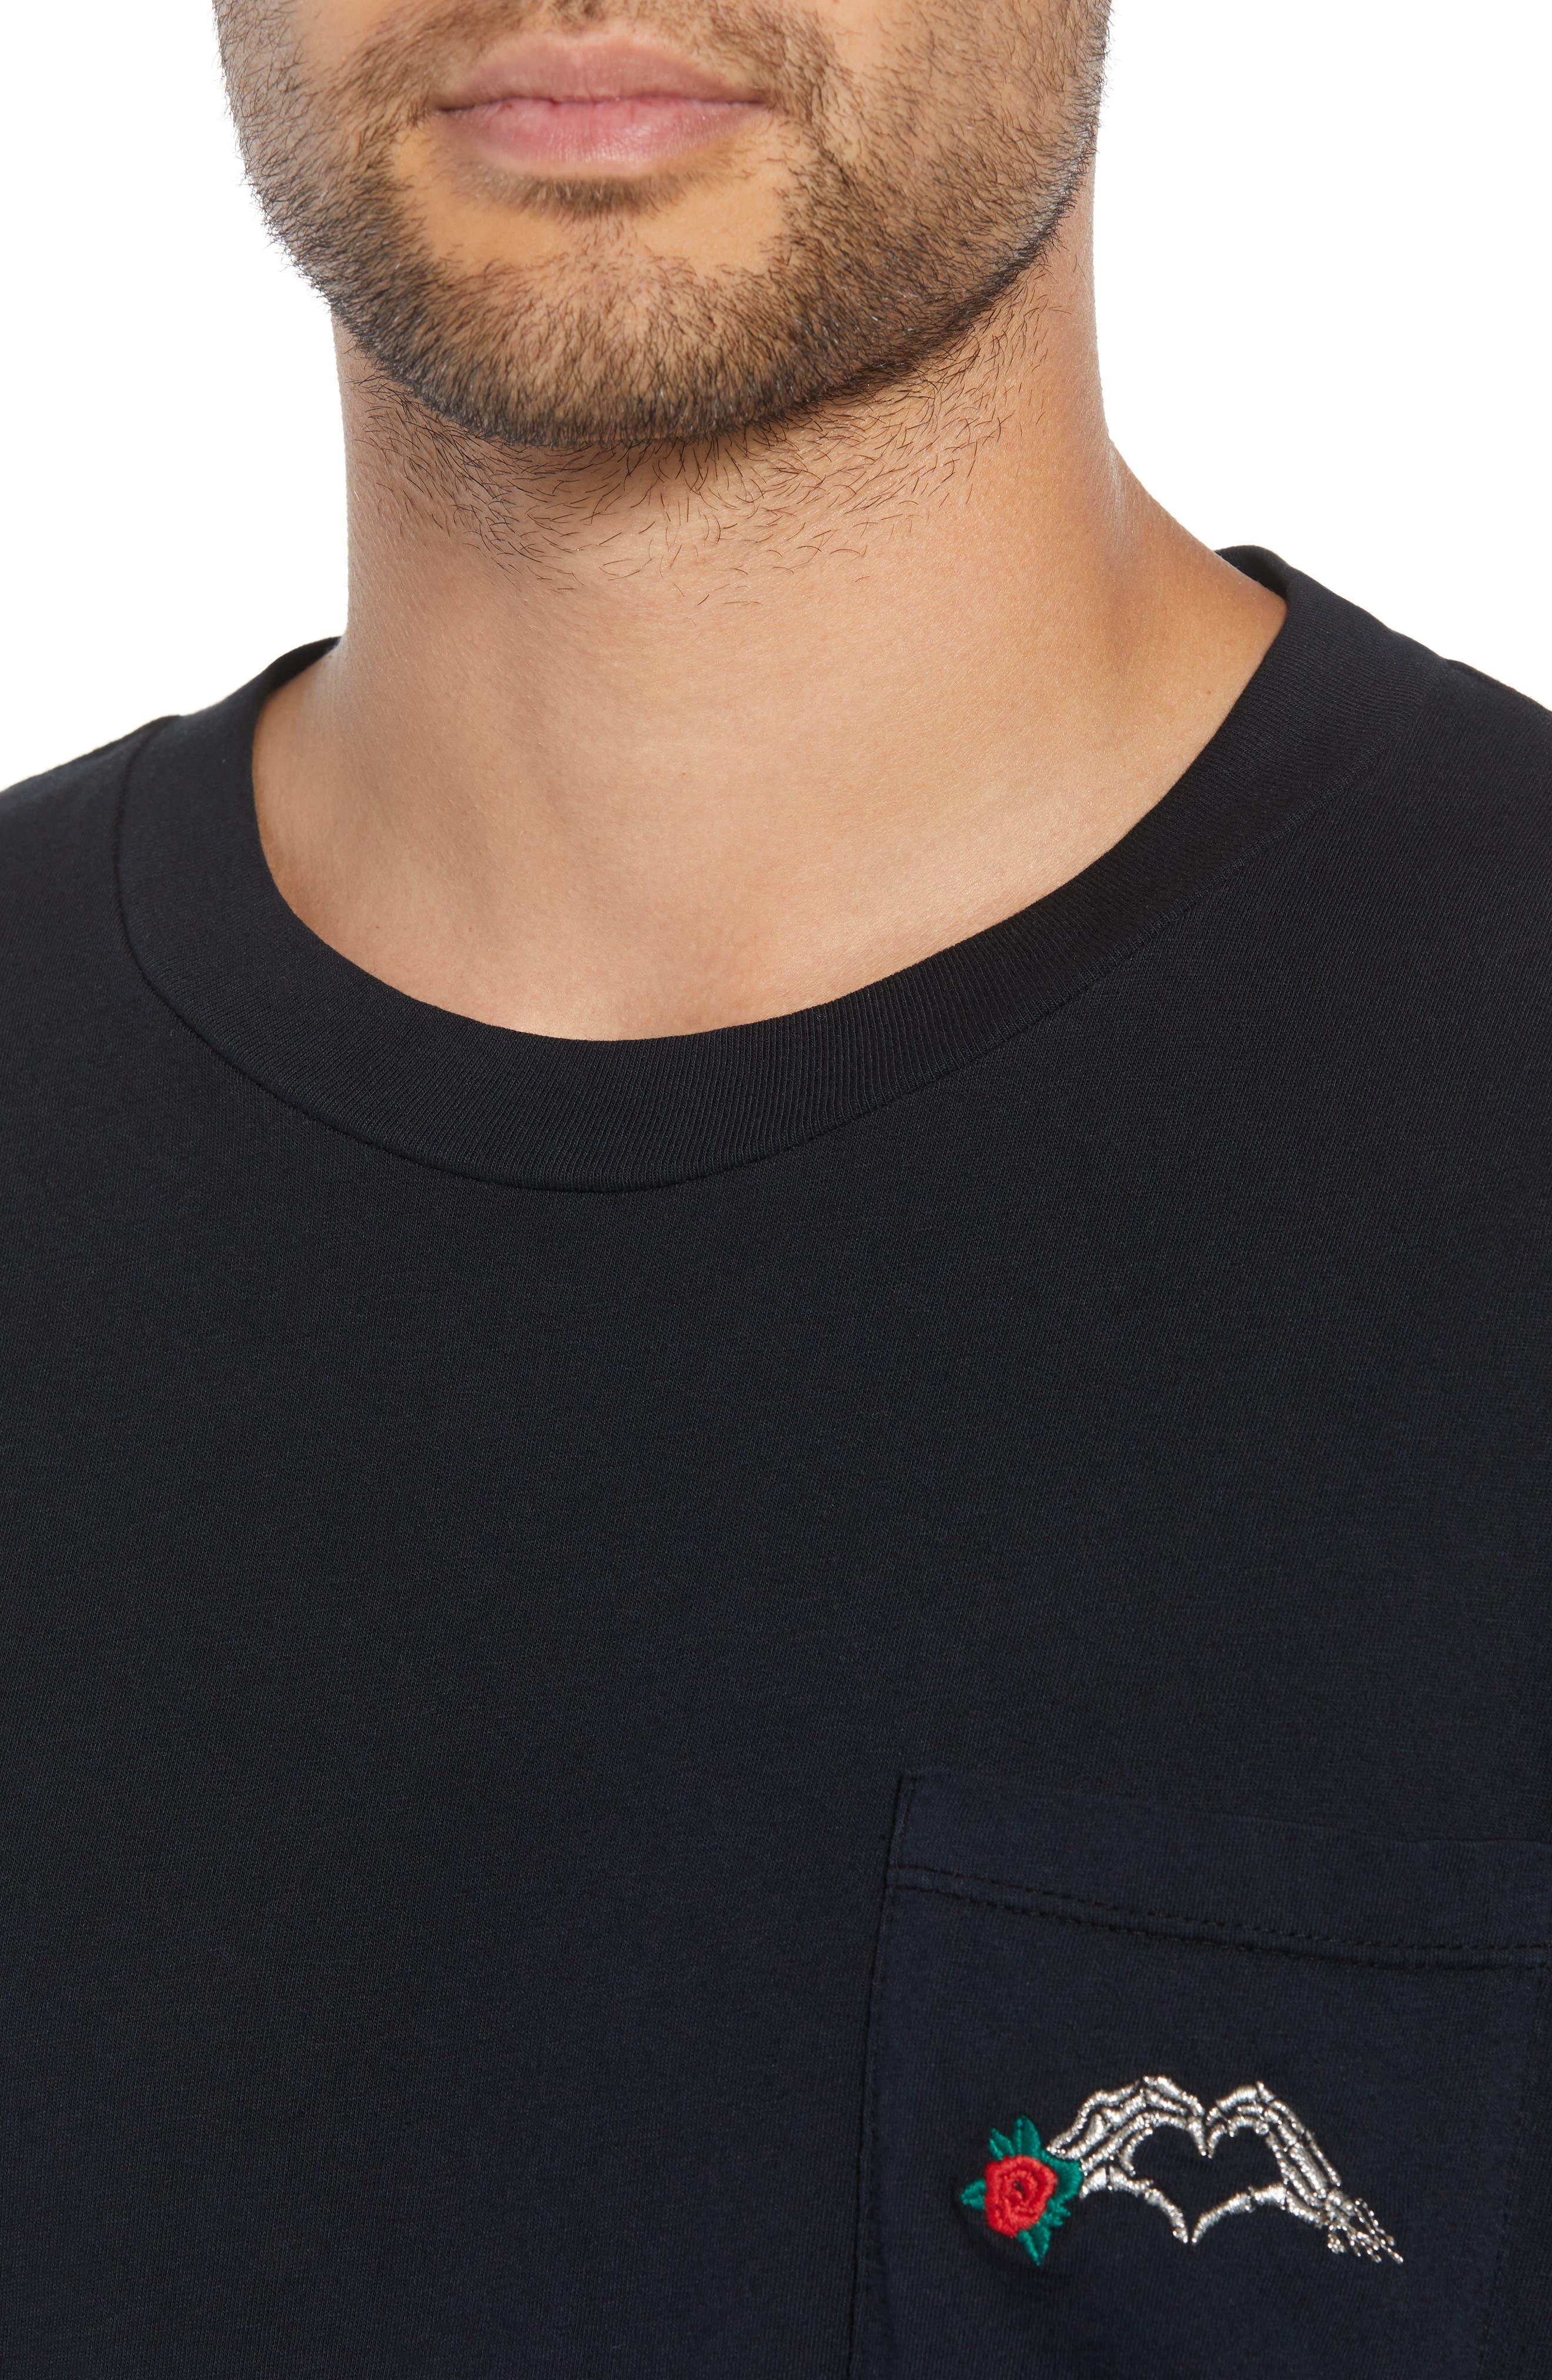 Hayes T-Shirt,                             Alternate thumbnail 4, color,                             001